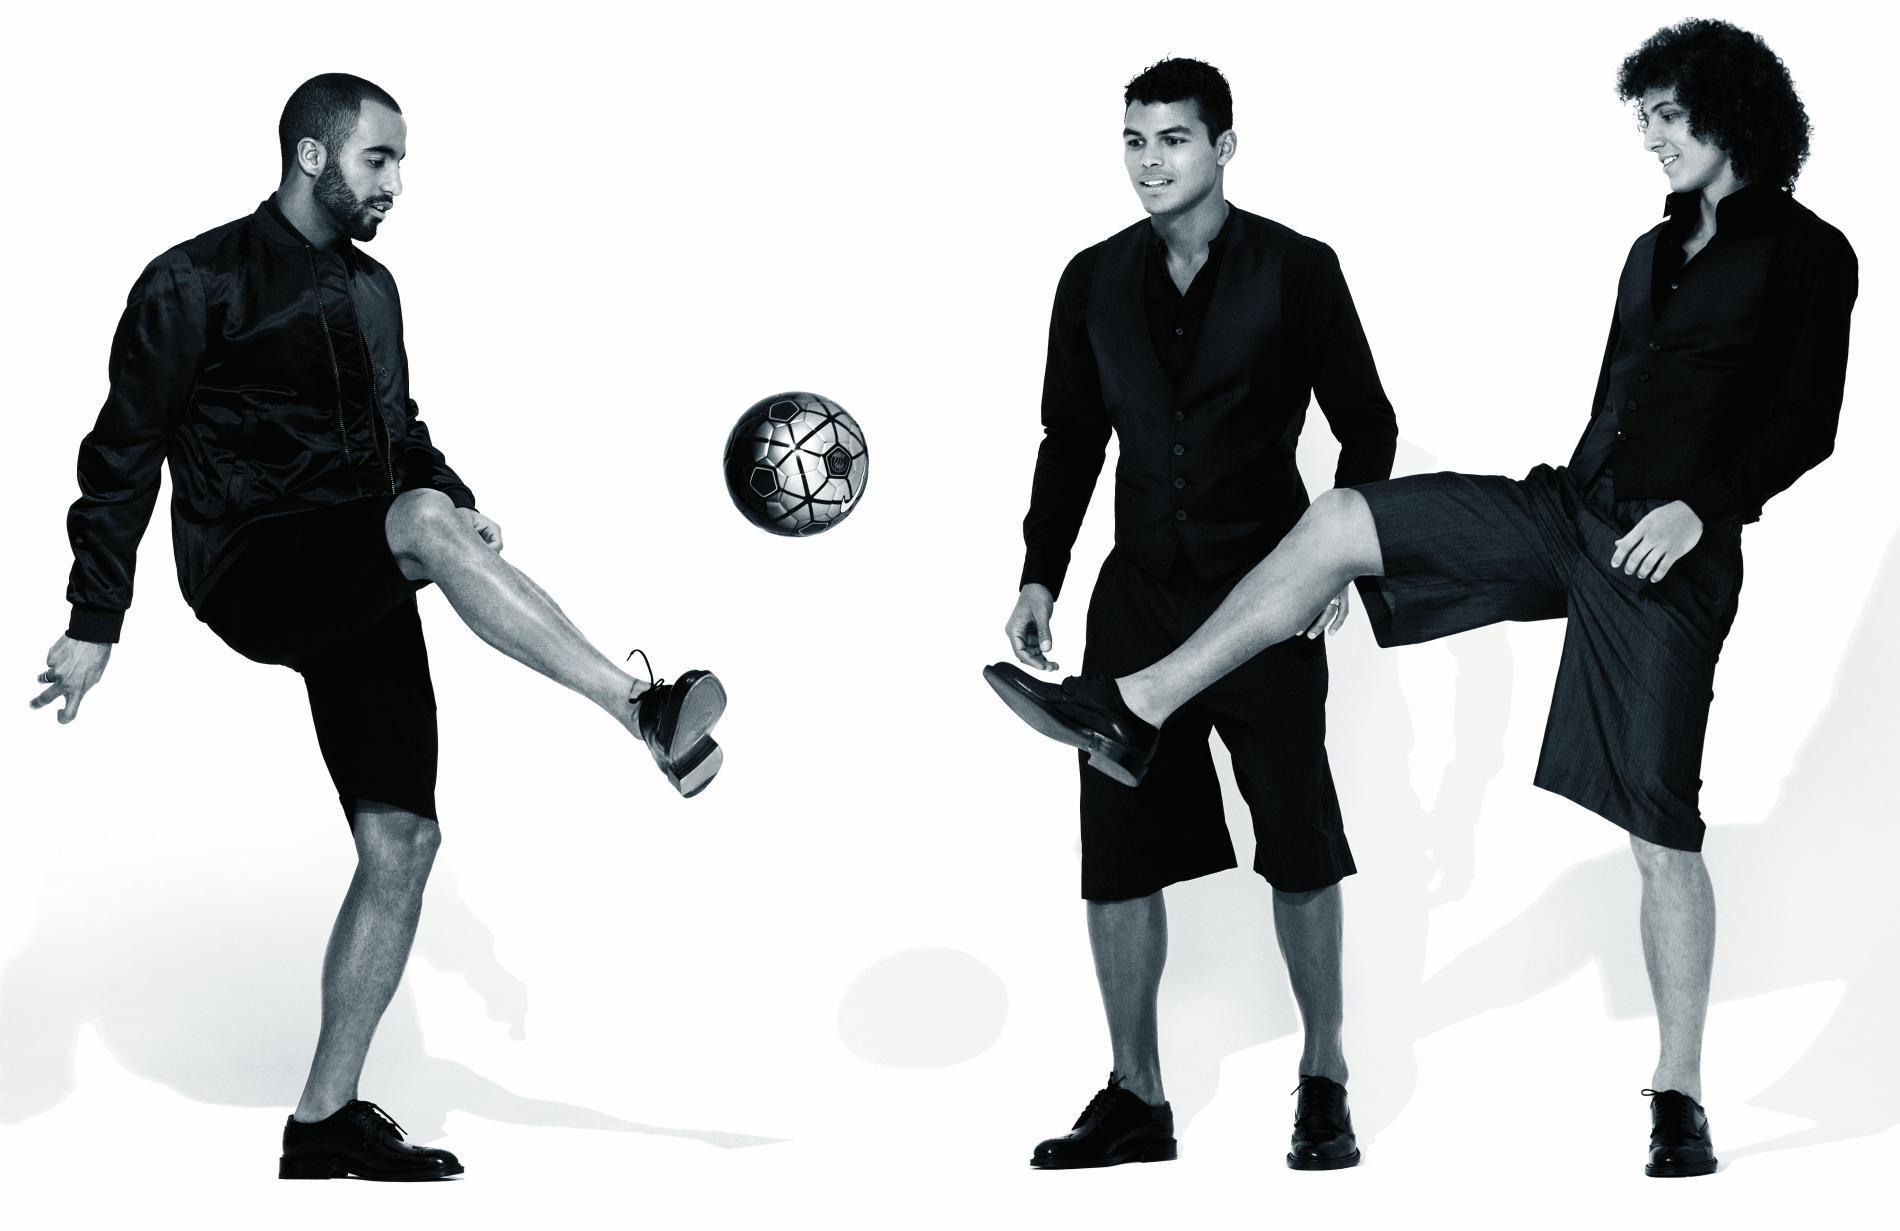 David Luiz, Thiago Silva et Lucas Moura : dieux du foot